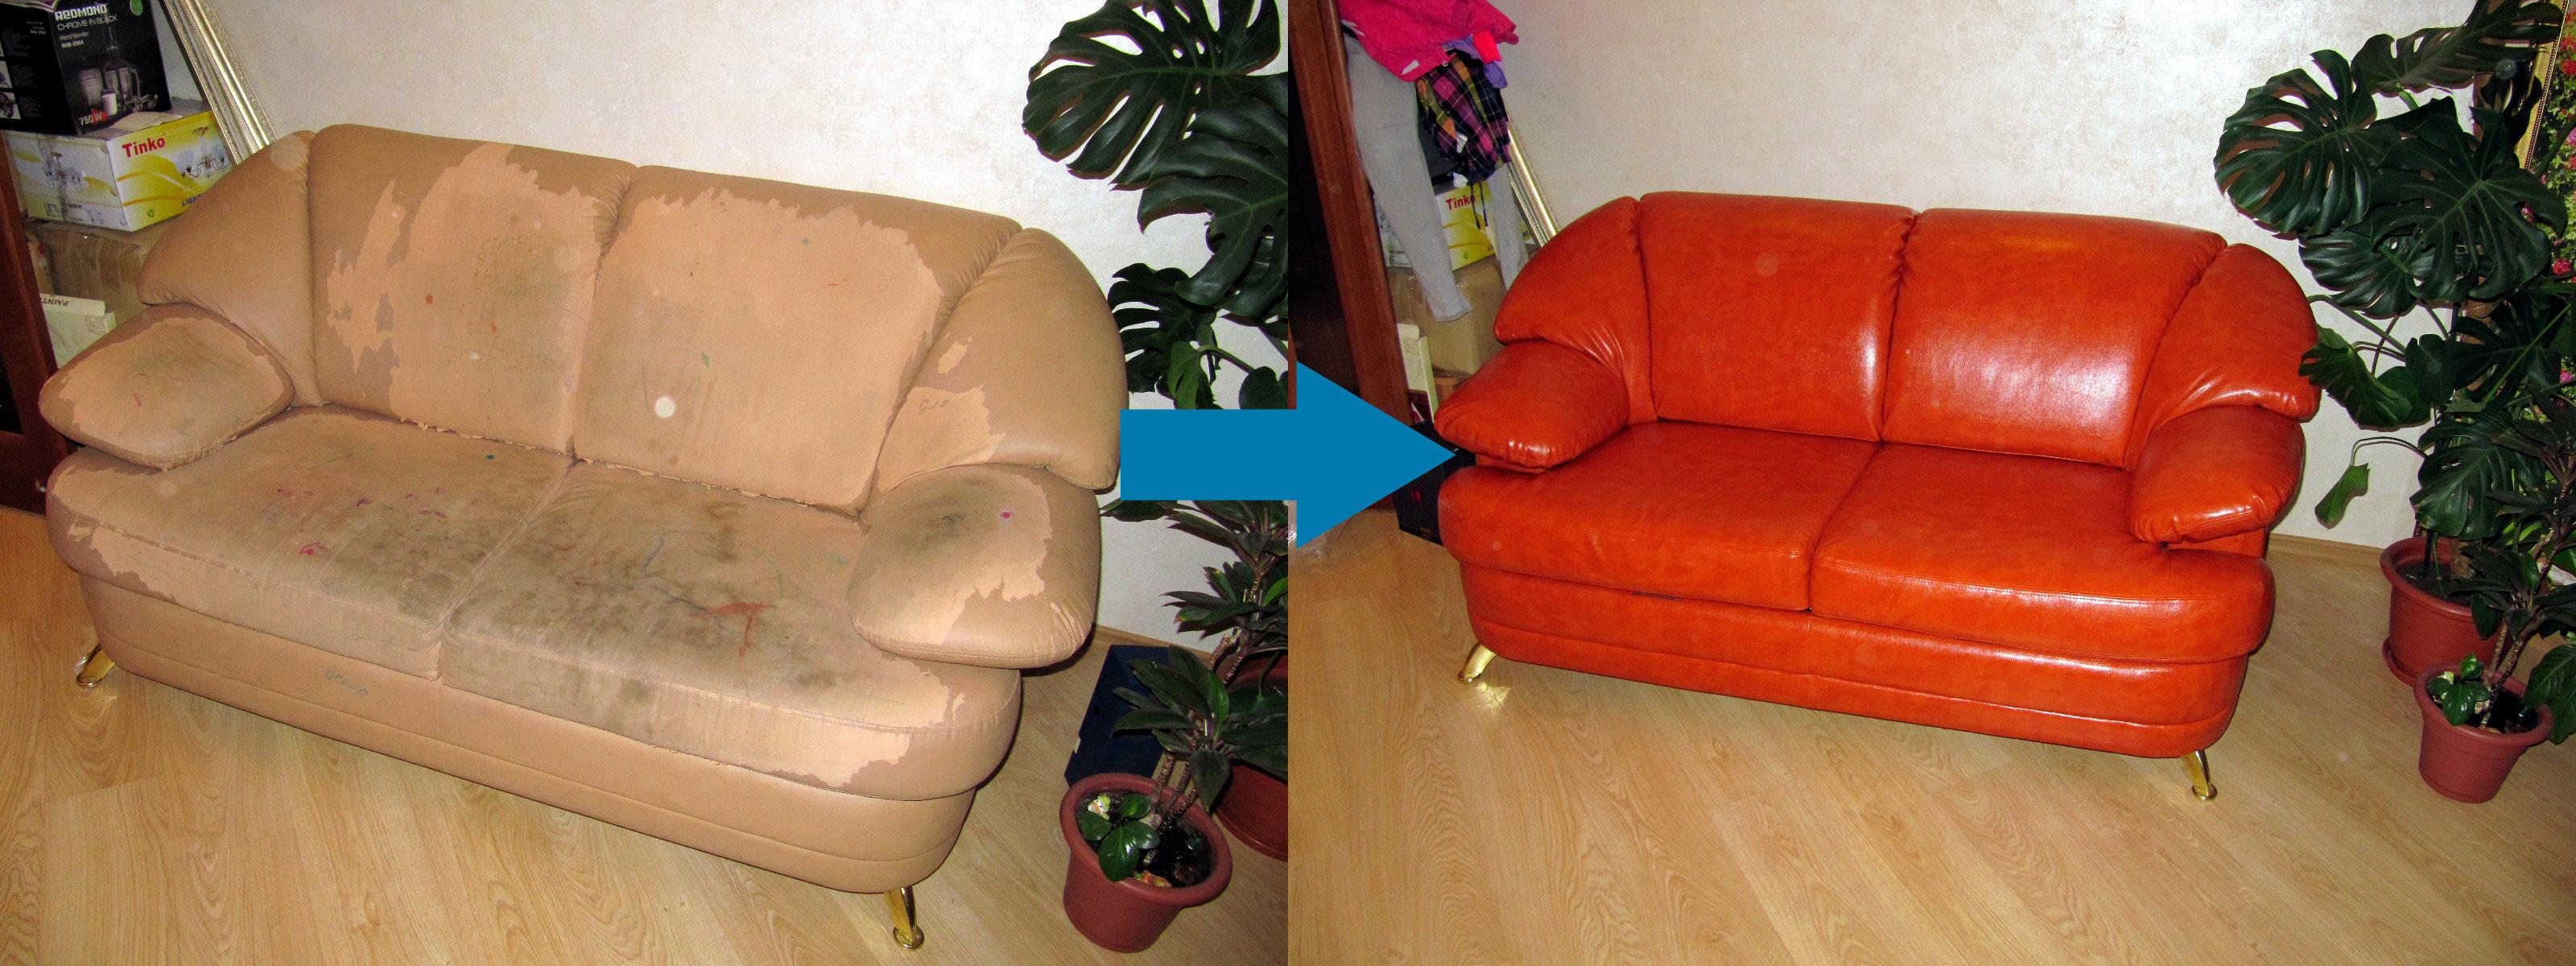 Пример обивки дивана